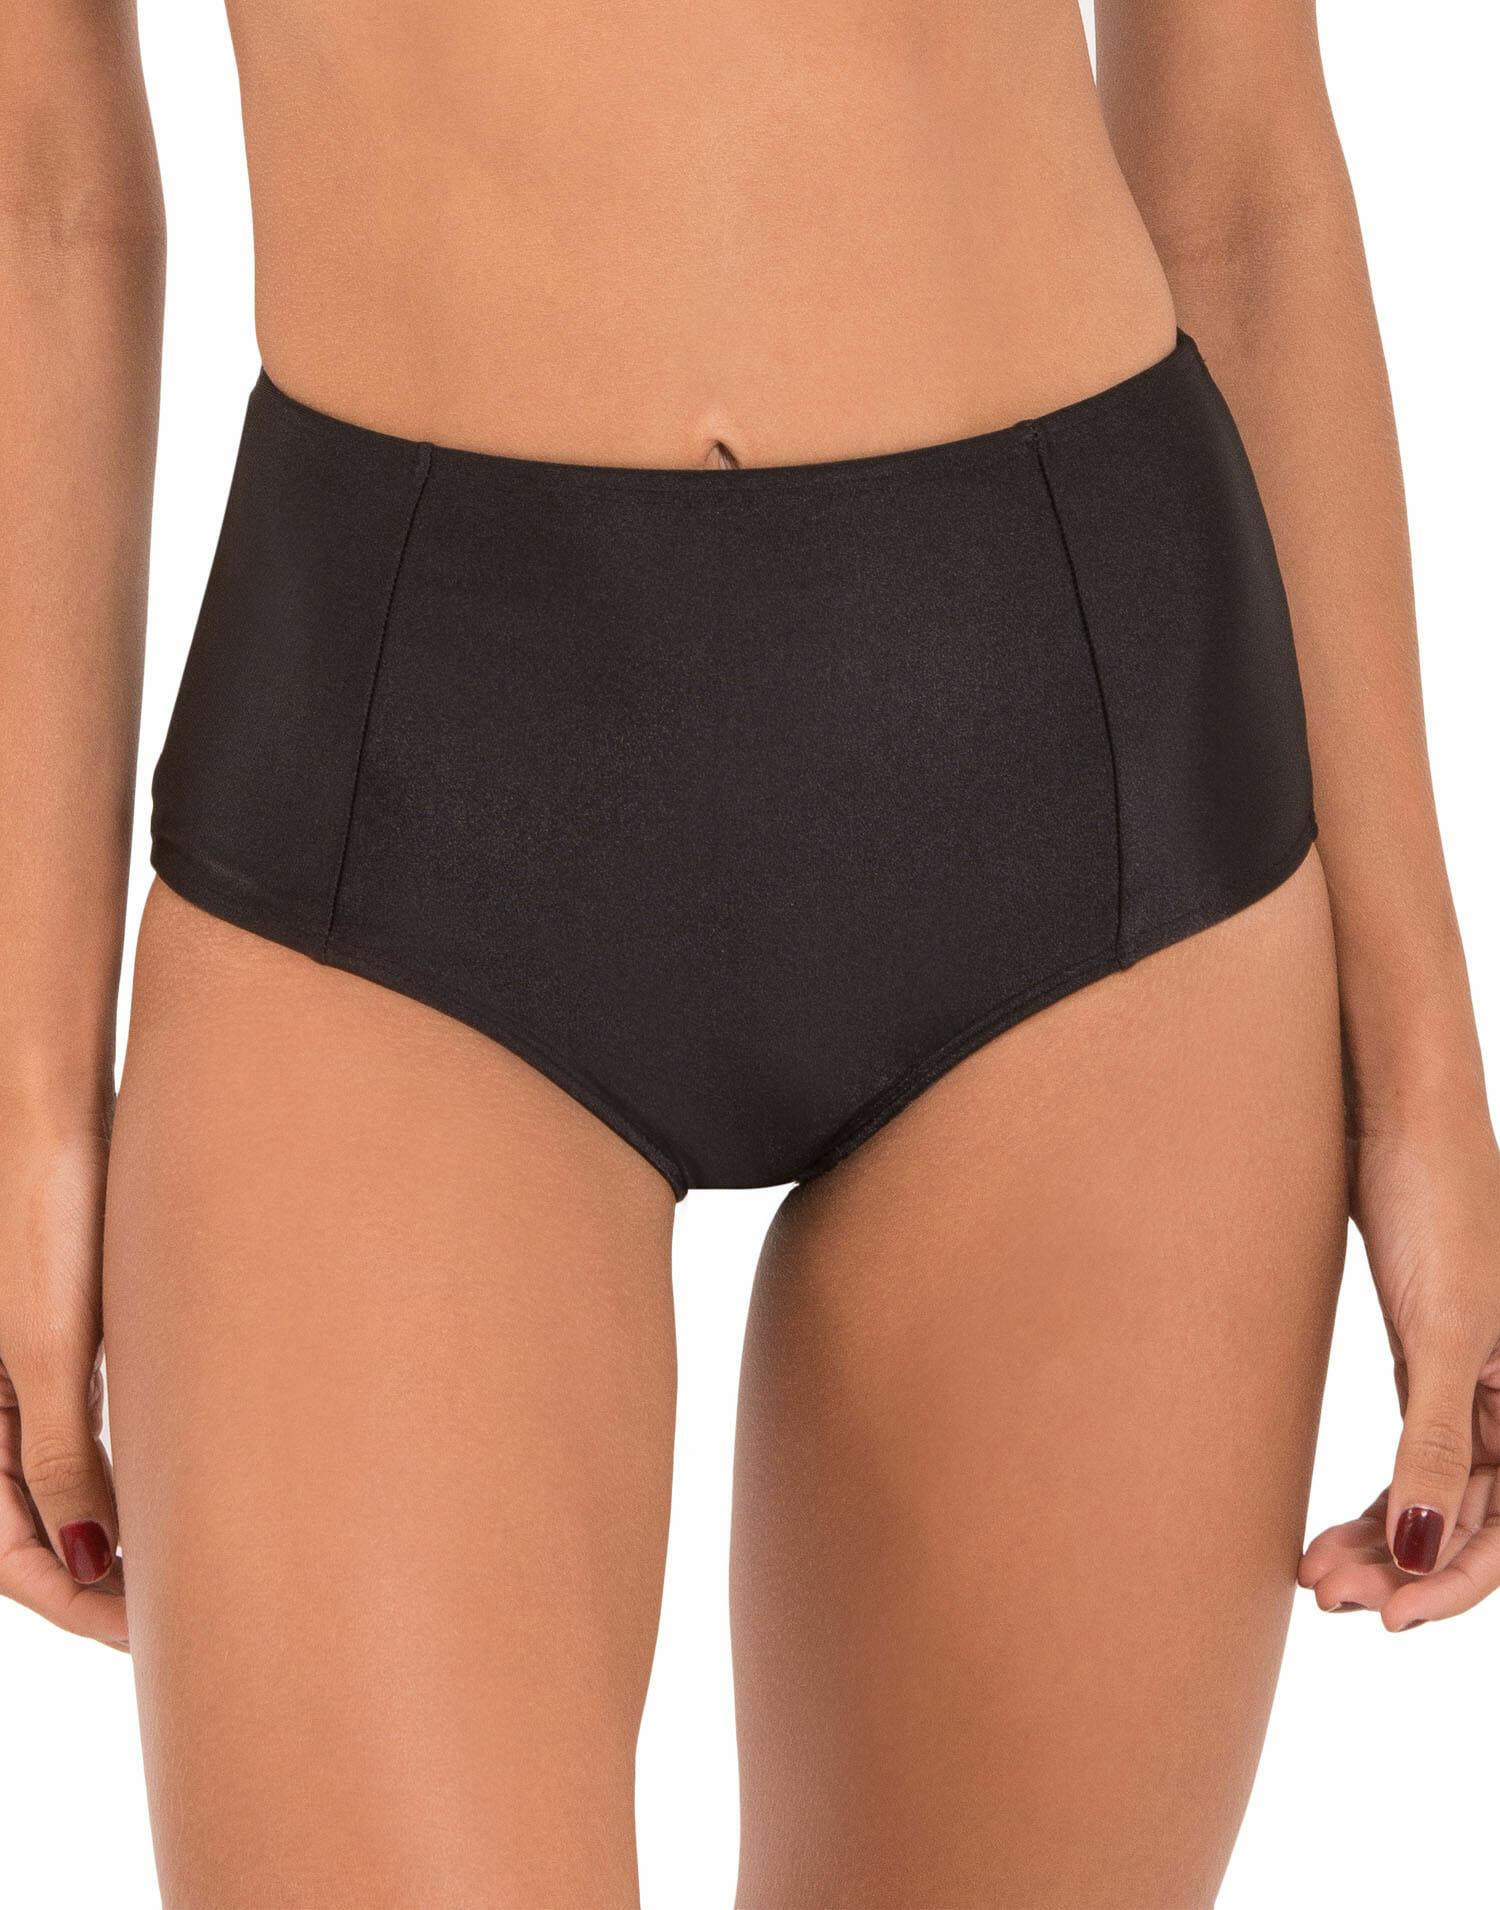 296997c0b Calcinha Hot Pants l Preto Liso - Blih! Brazilian Bikini